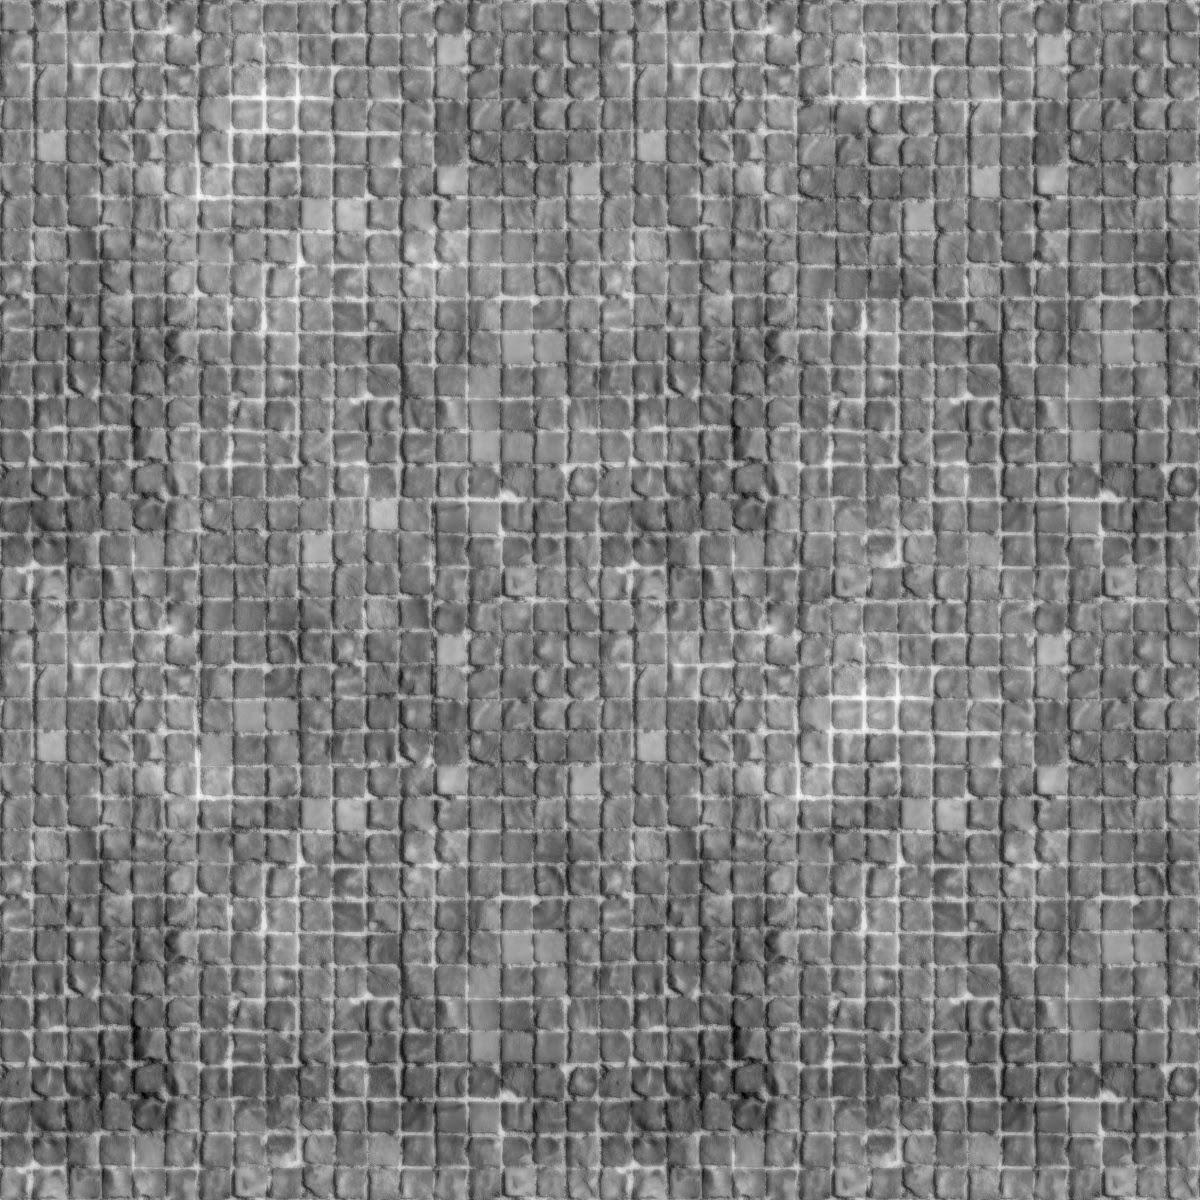 Seamless Brick Stone Pavement Texture Maps Texturise